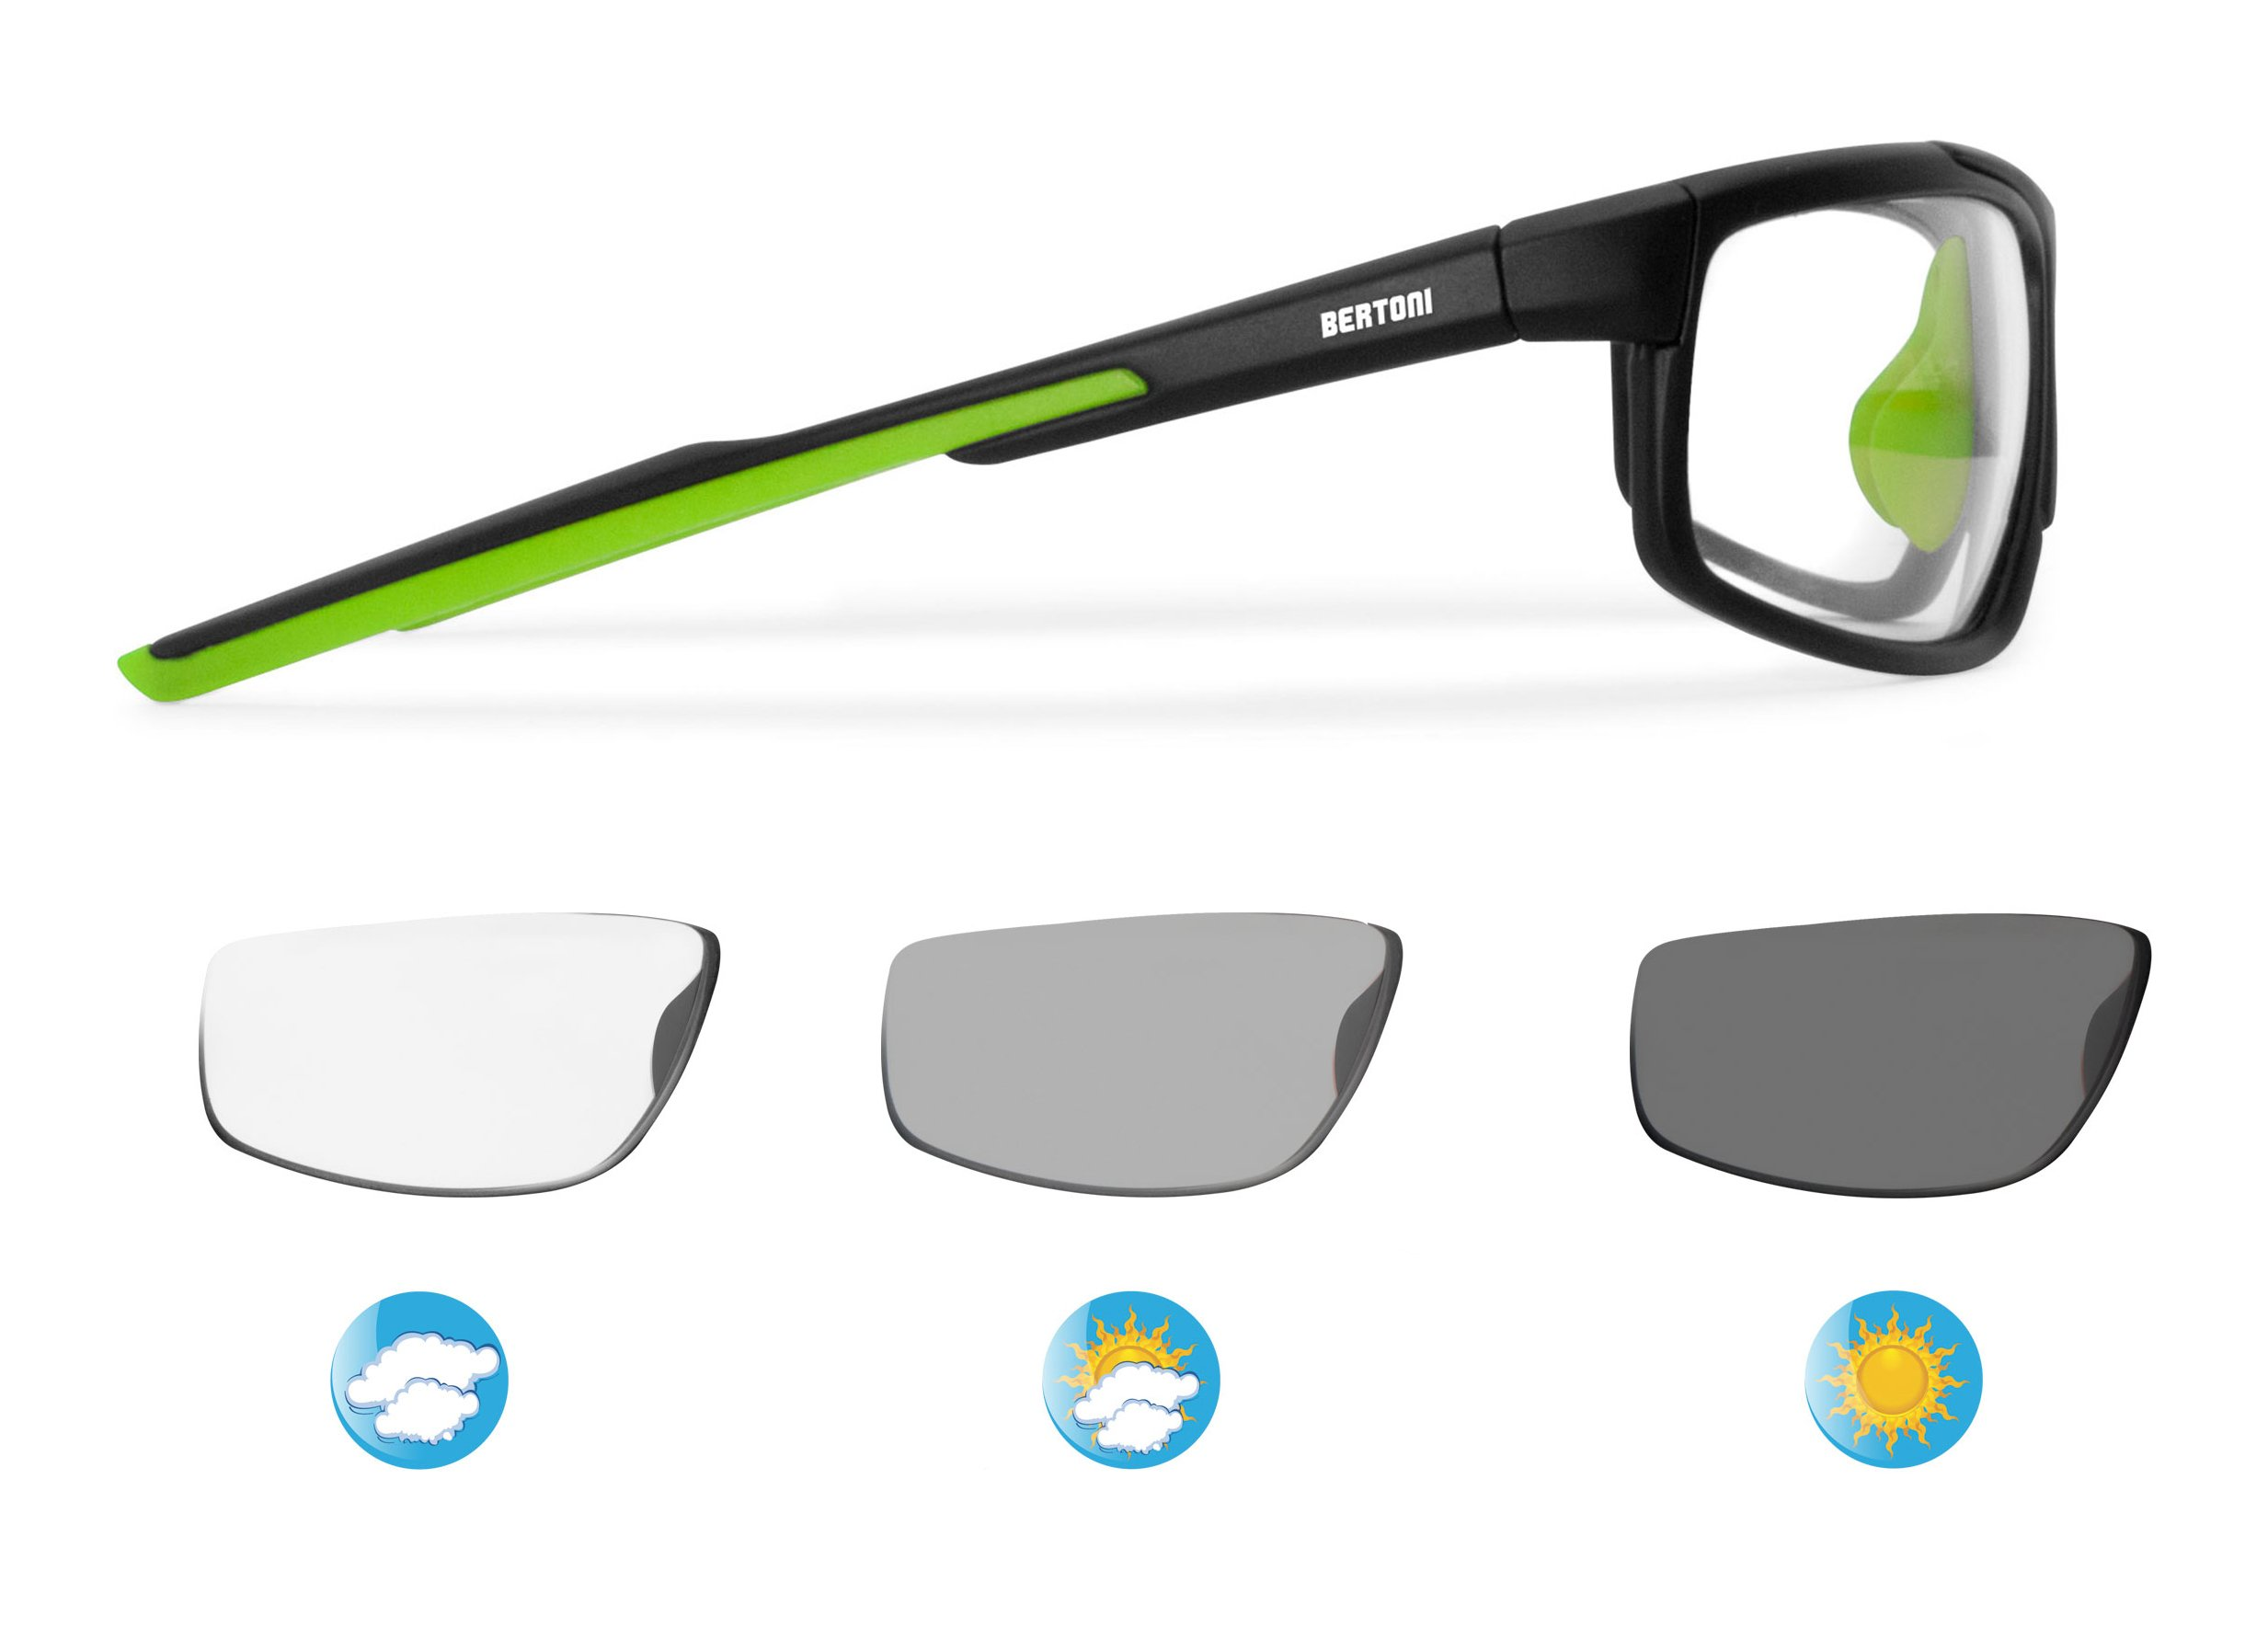 Bertoni Sports Polarized Sunglasses Photochromic Cycling Ski Running Golf w Antifog Lens w Adjustable Nose - mod. F180 Sunsensor Glasses w Tr90 Durable Frame